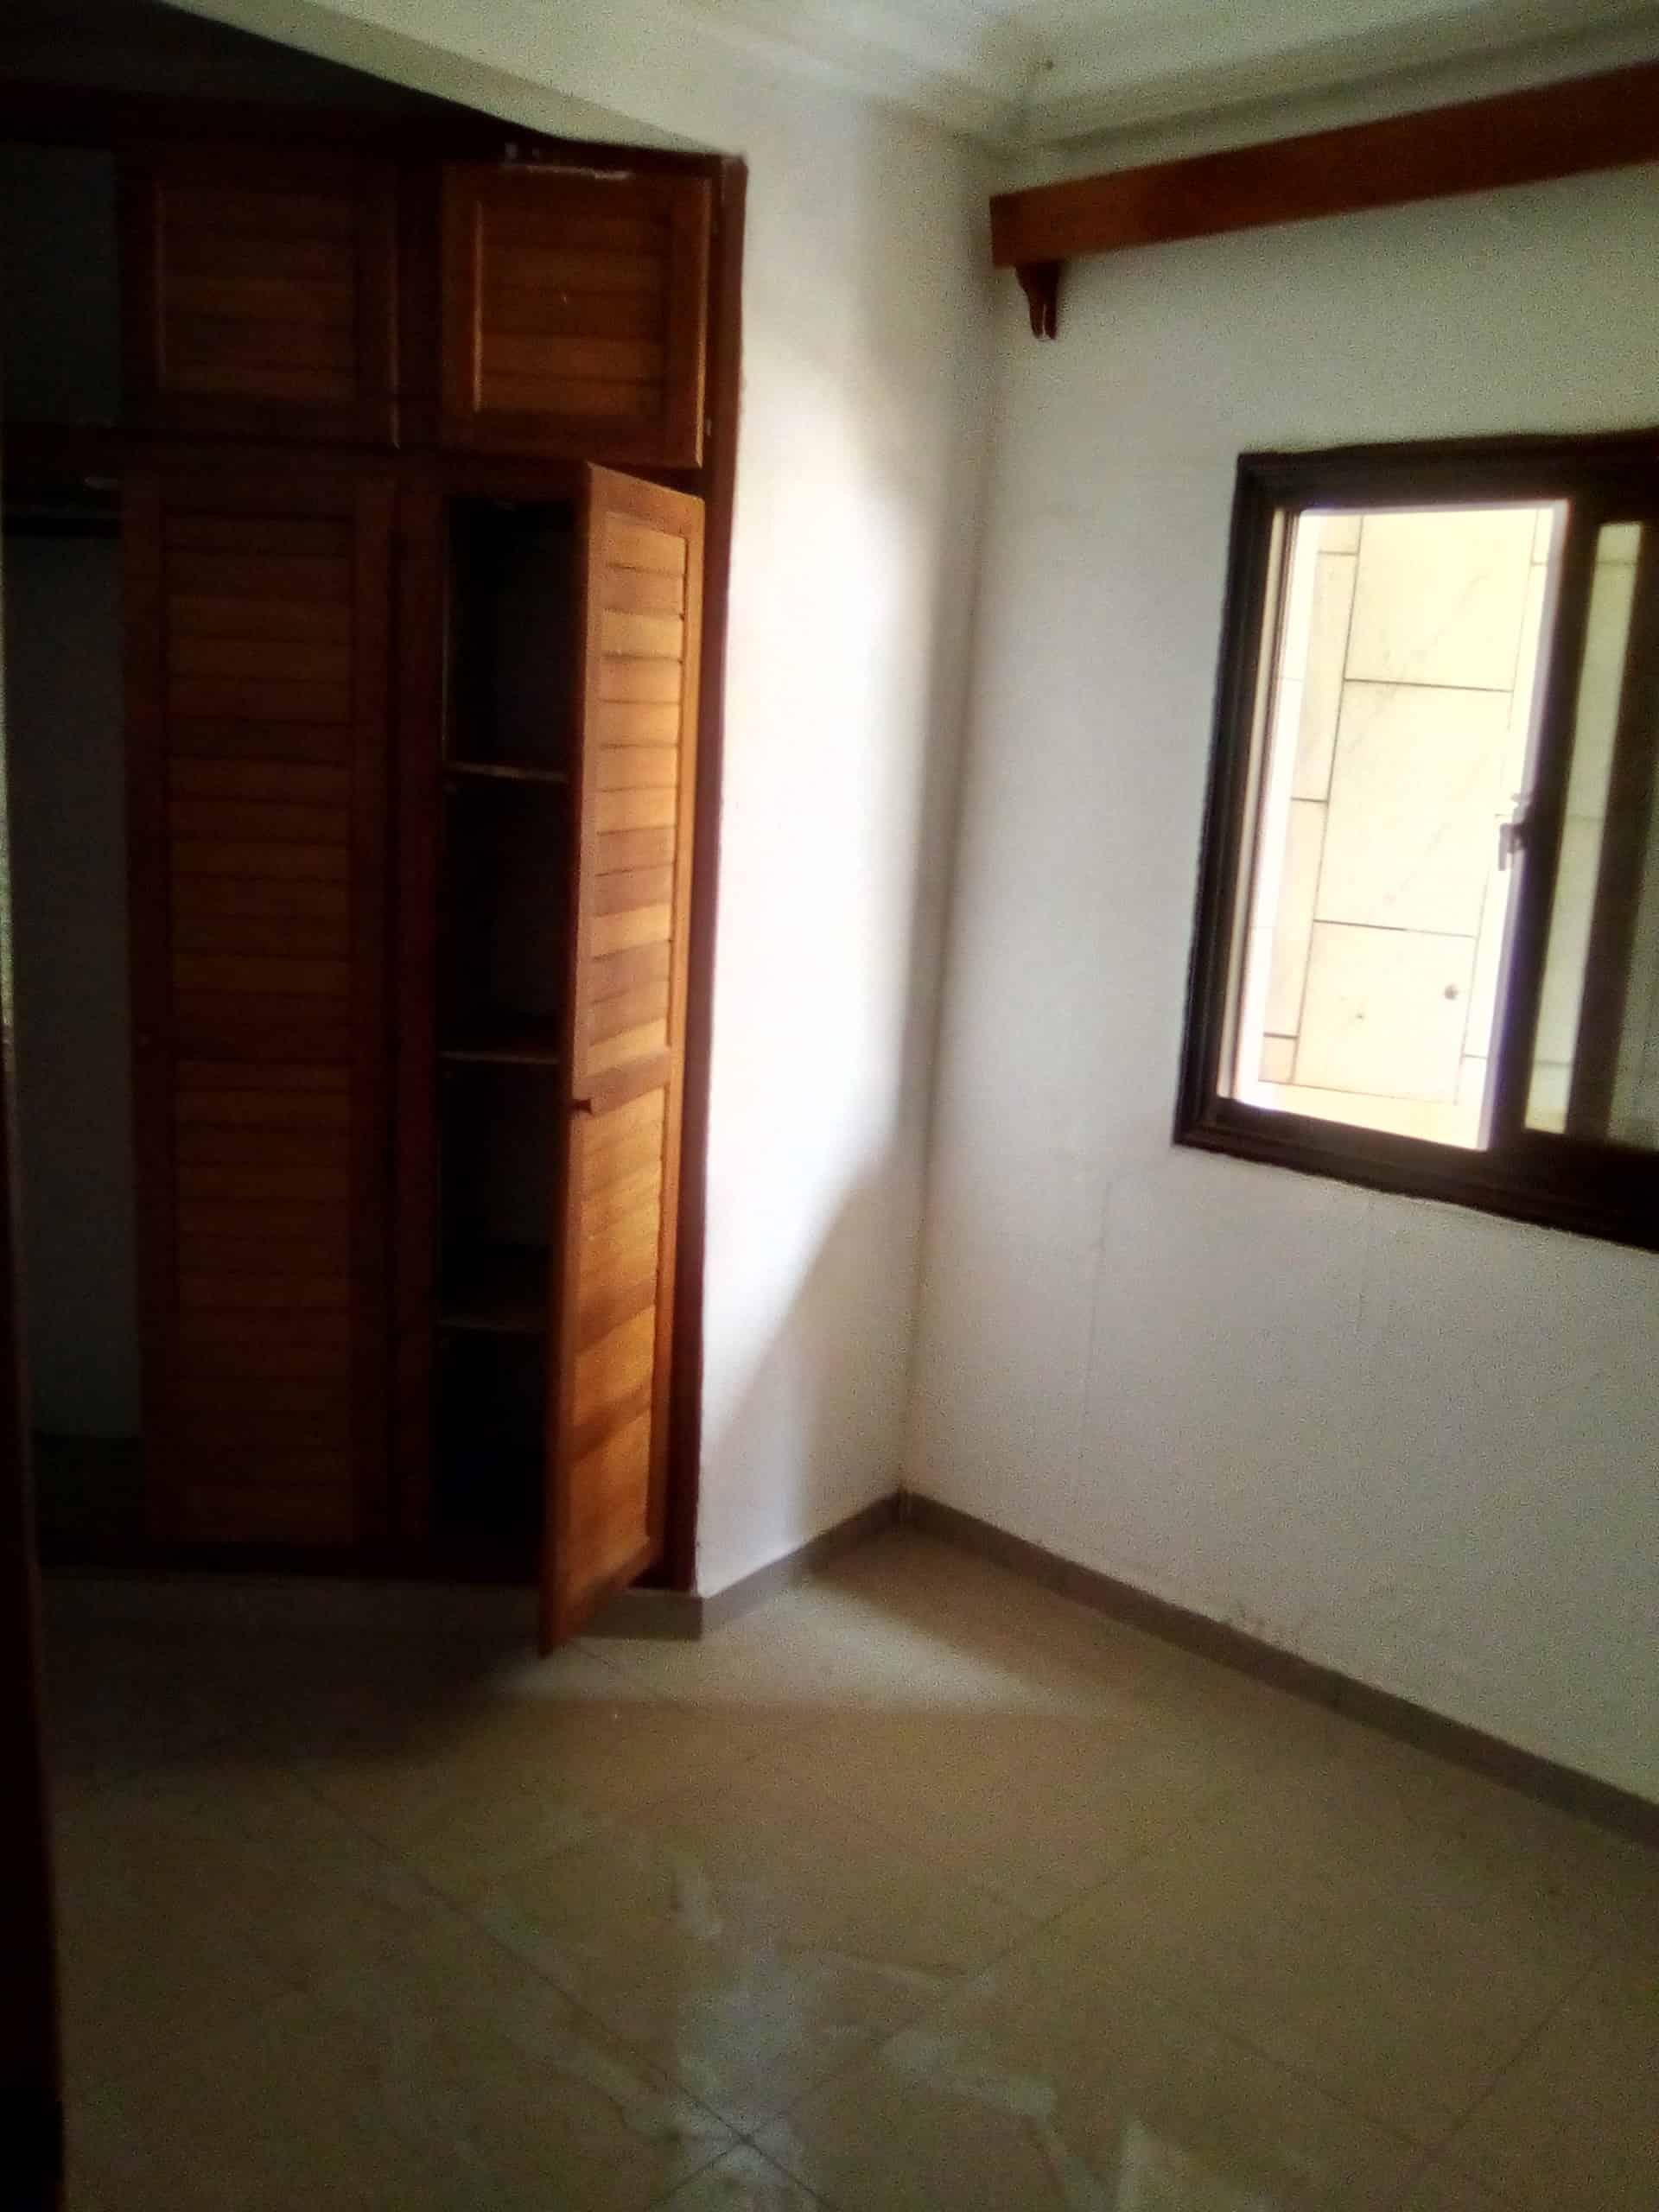 Apartment to rent - Douala, Akwa I, Vers kotto résidence - 1 living room(s), 3 bedroom(s), 2 bathroom(s) - 150 000 FCFA / month